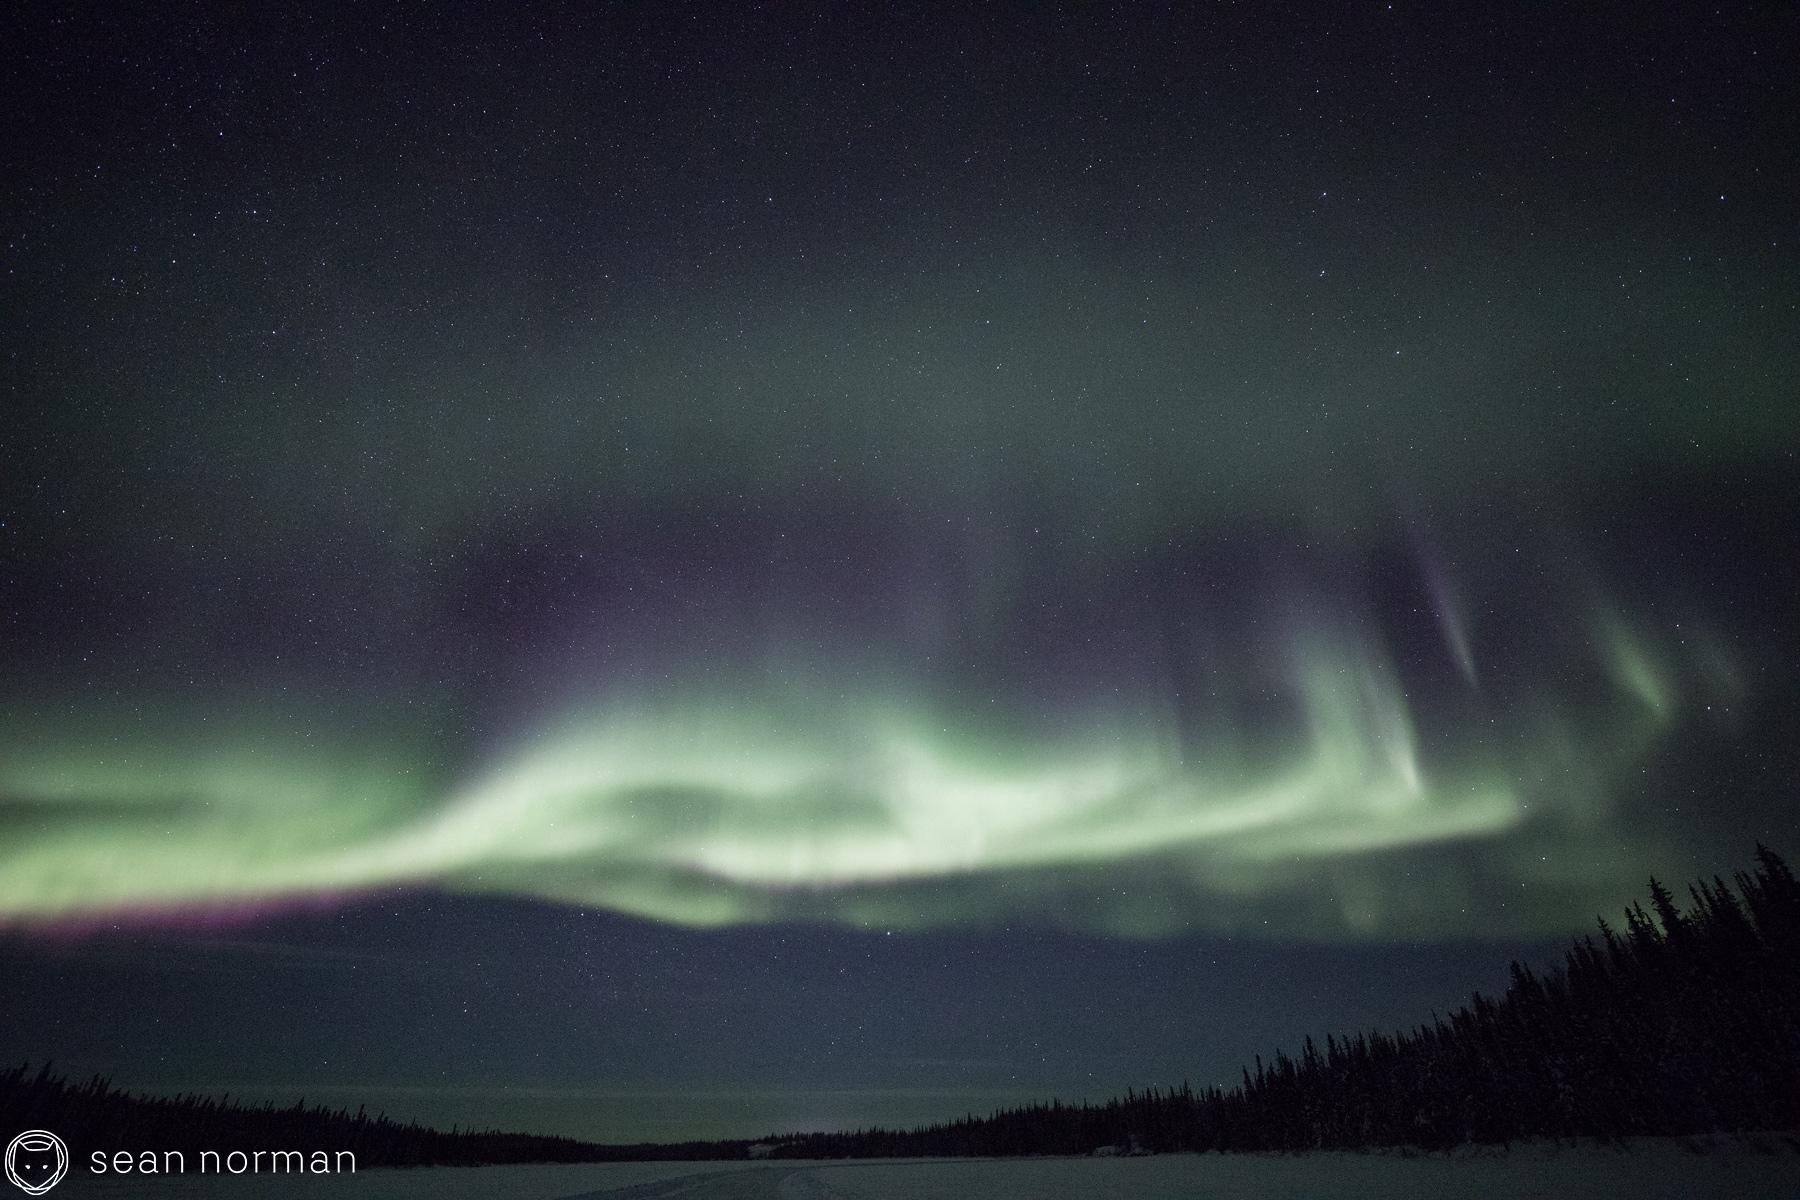 Sean Norman Yellowknife Aurora Chaser - Northern Light Photography - 5.jpg